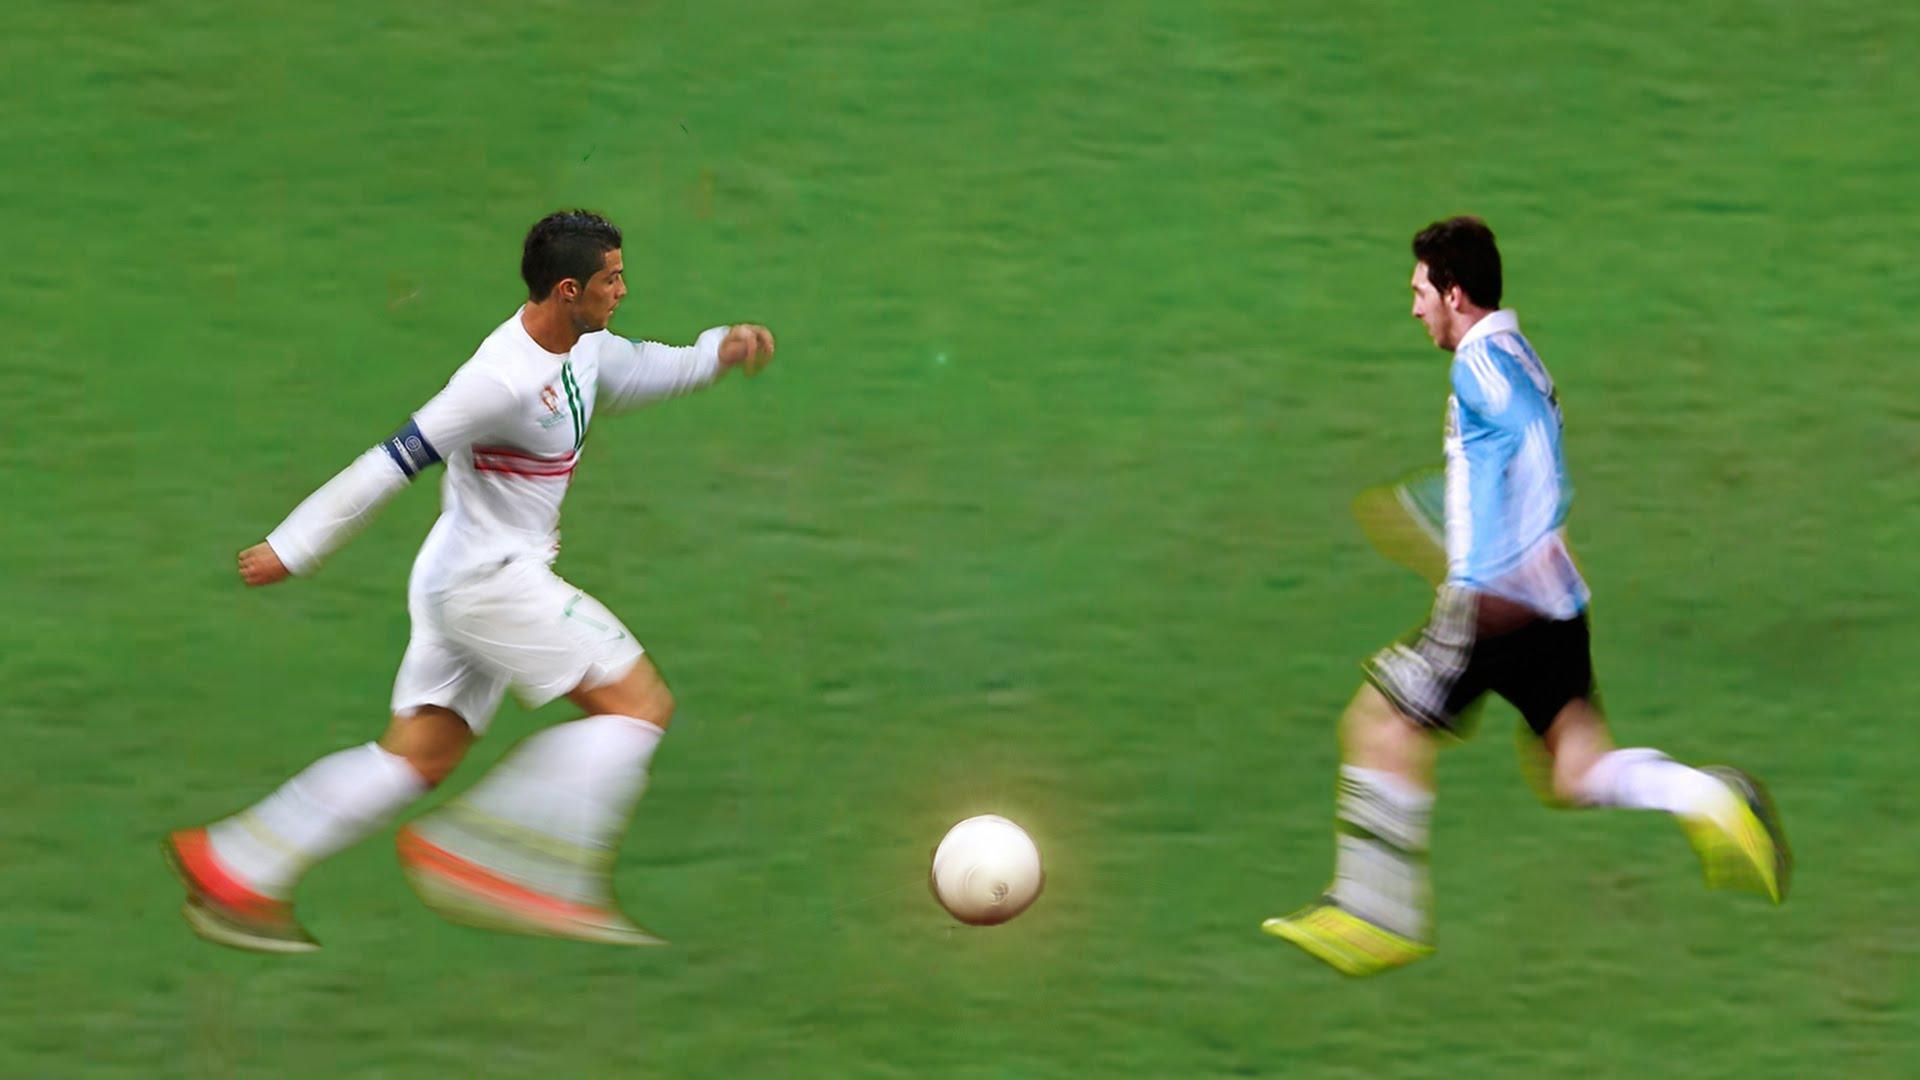 Cristiano Ronaldo Vs Lionel Messi ● Legendary Dribbling Skills